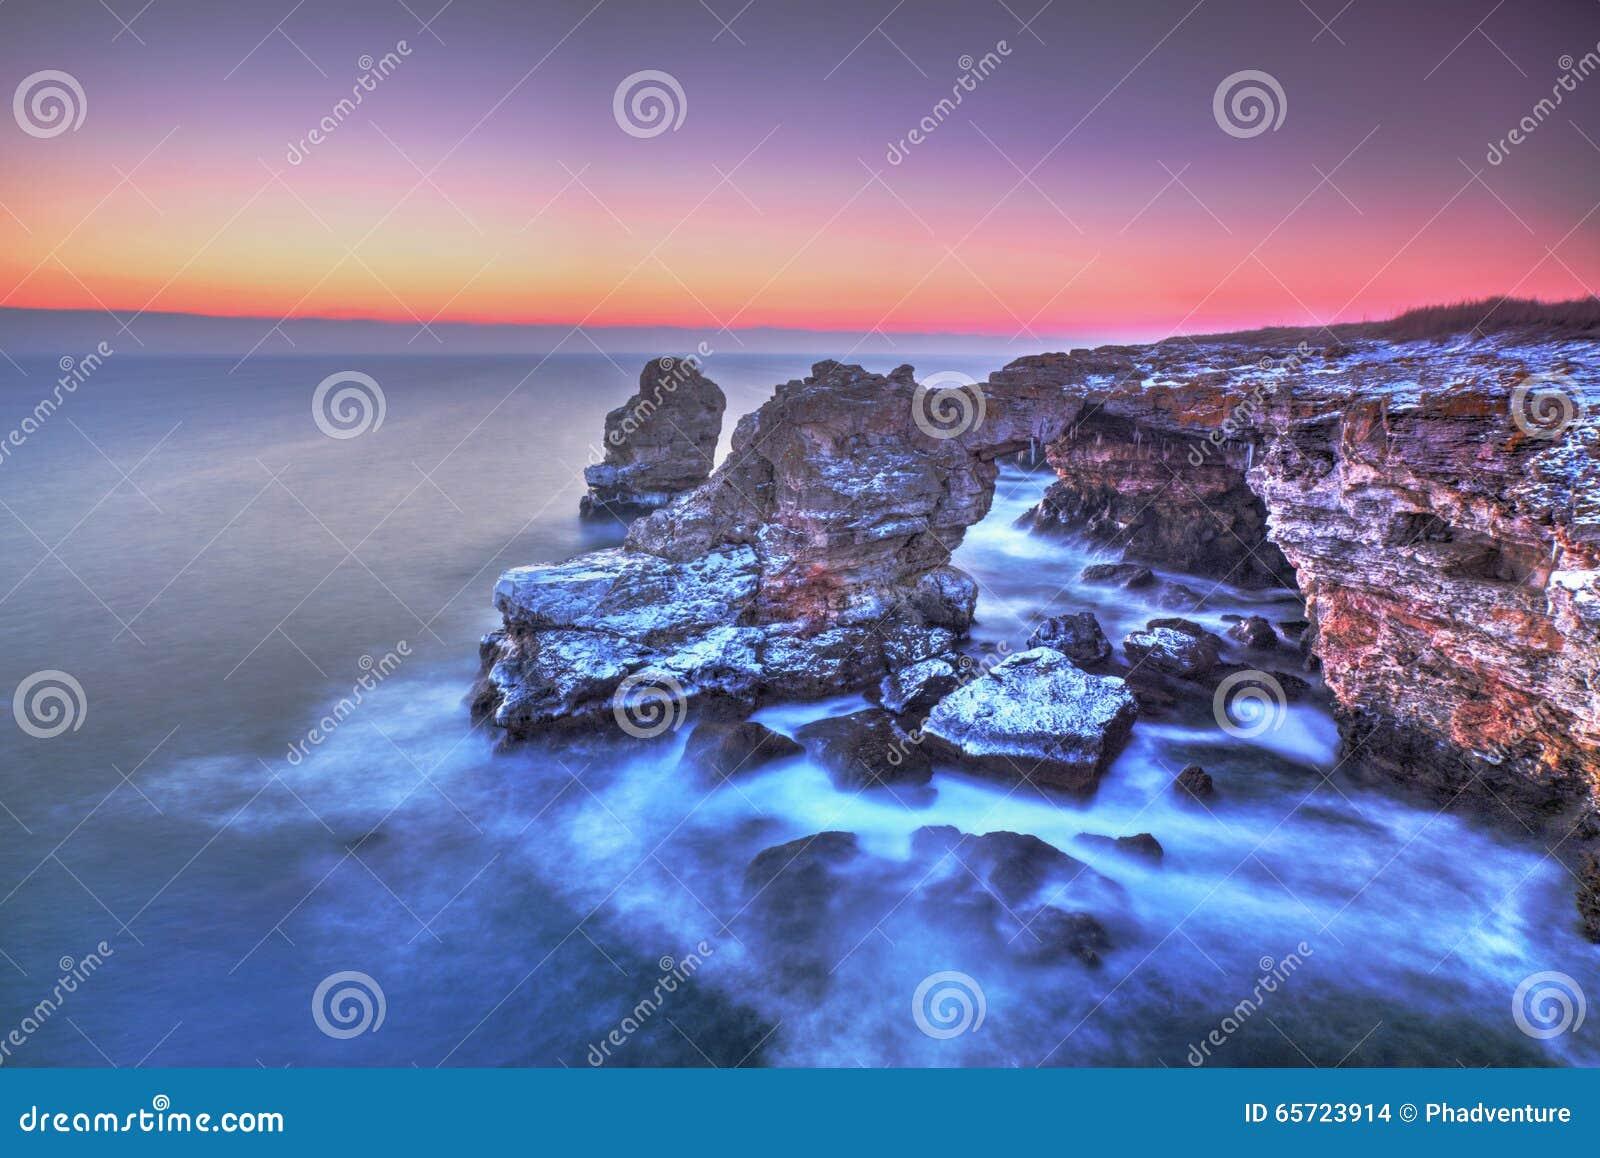 Sunrise over the sea and rocky shore